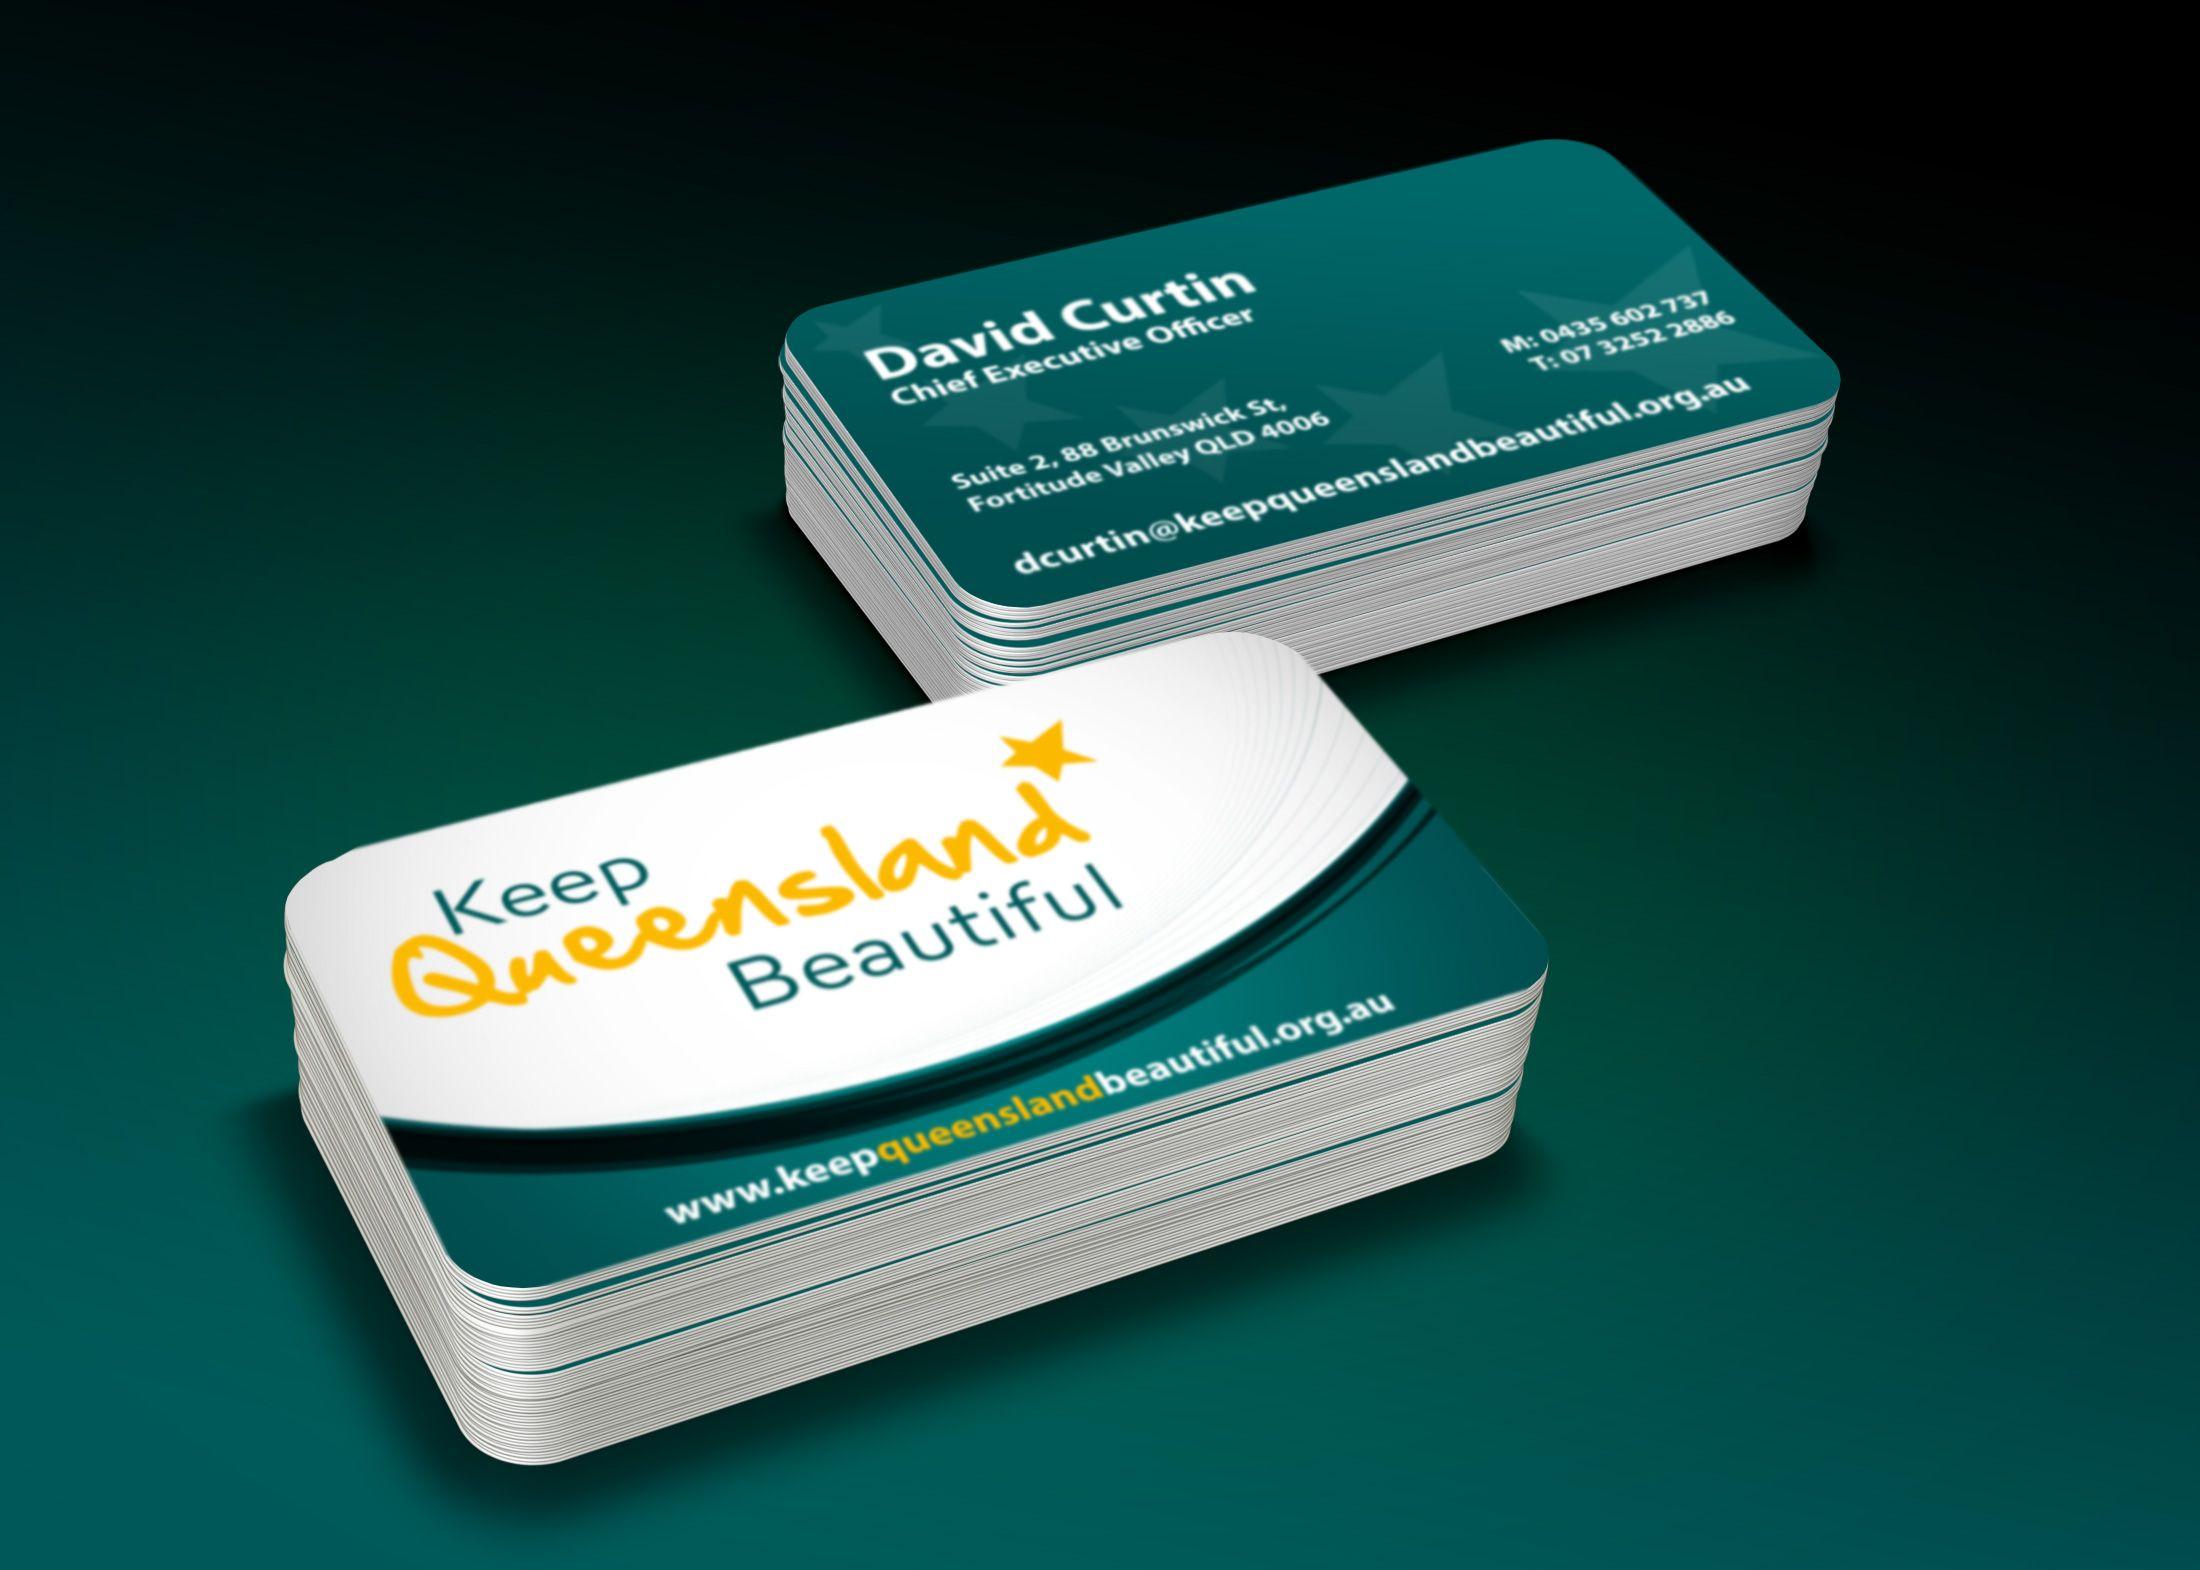 Keep Queensland Beautiful Business Card   Business Cards Designs ...